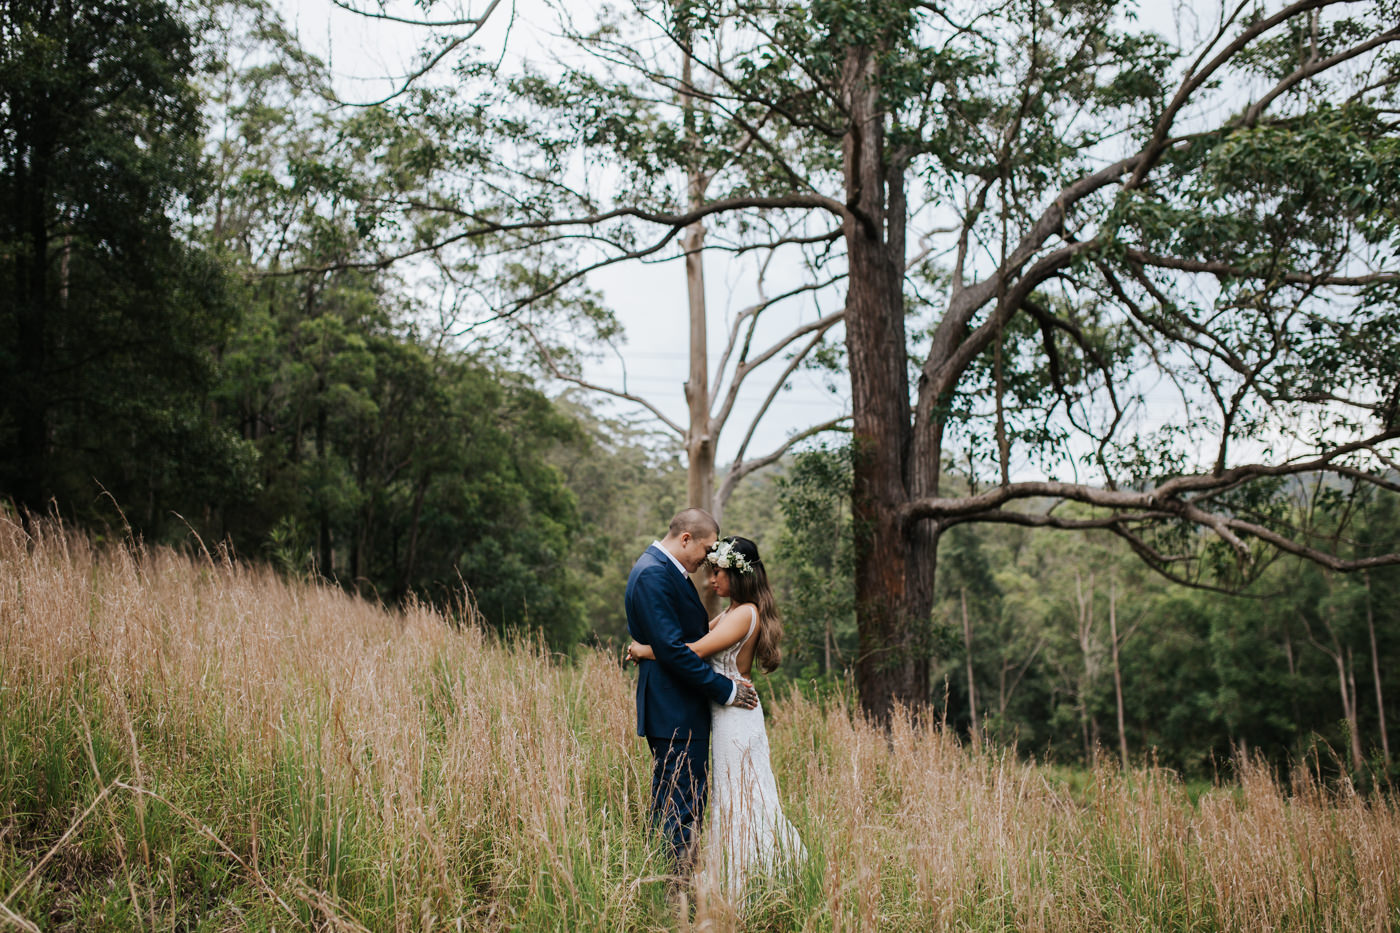 Nick & Vanezza - Fernbank Farm Wedding - Samantha Heather Photography-115.jpg